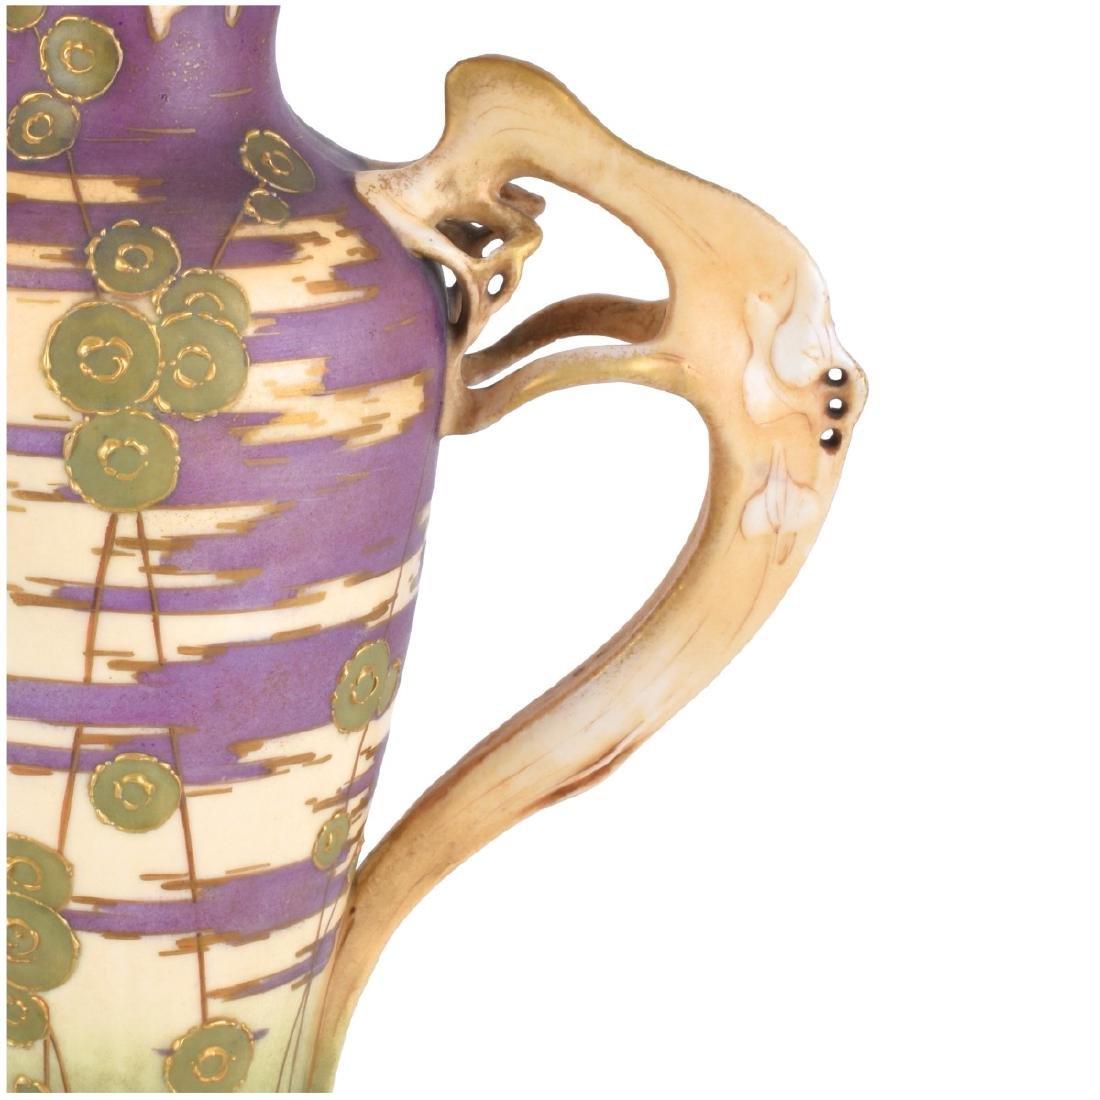 Turn Teplitz Amphora Reticulated Pottery Ewer - 3